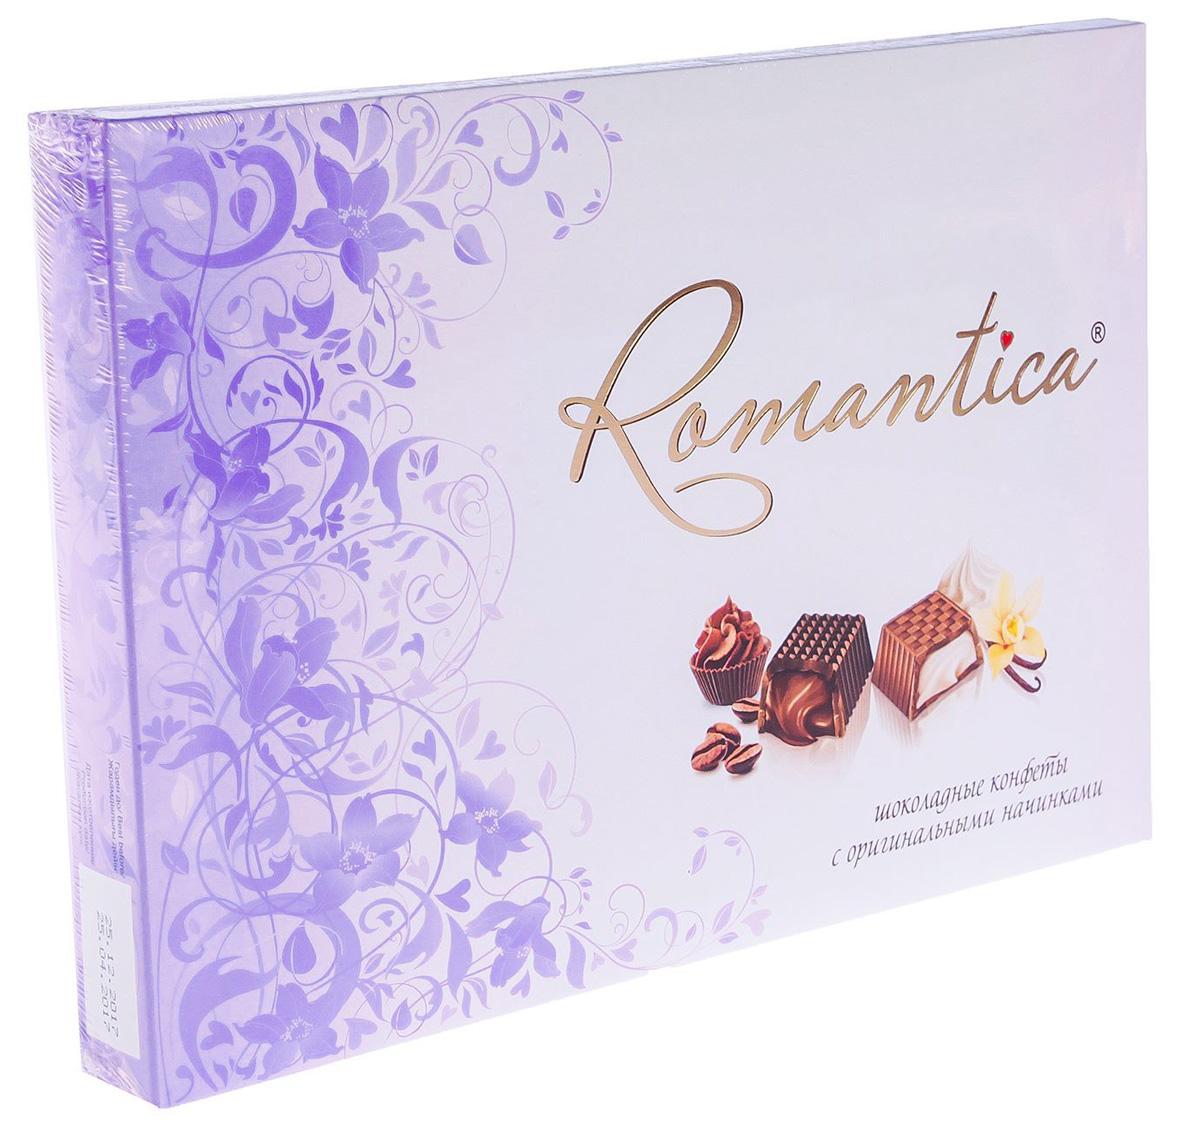 Славянка Romantica набор конфет (сиреневый), 160 г славянка romantica набор конфет 320 г бирюзовая упаковка